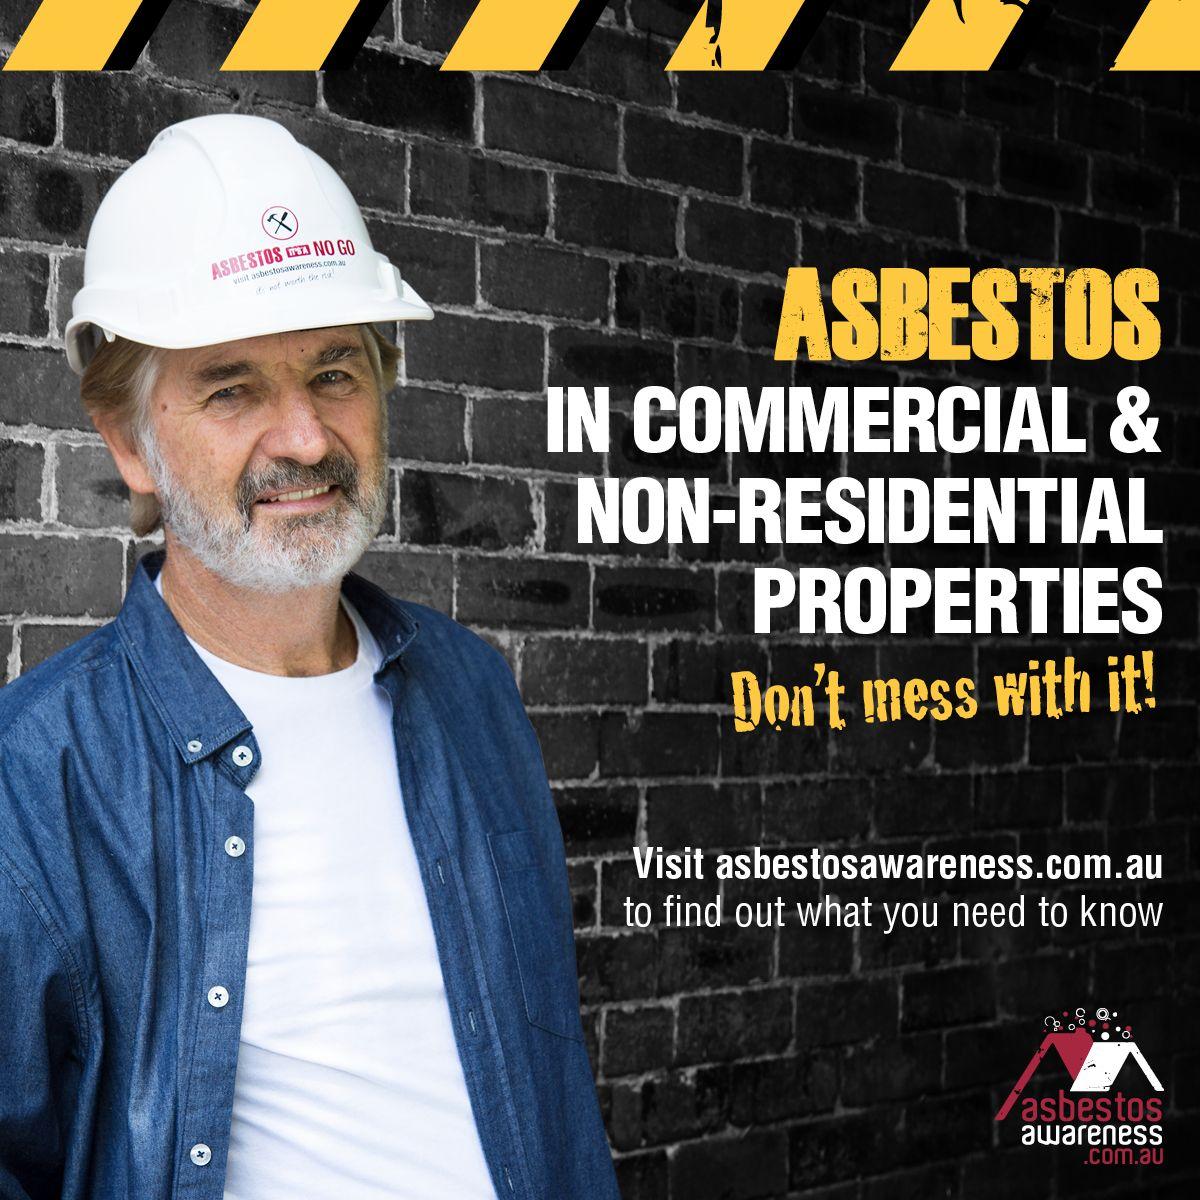 asbestosawareness.com.au